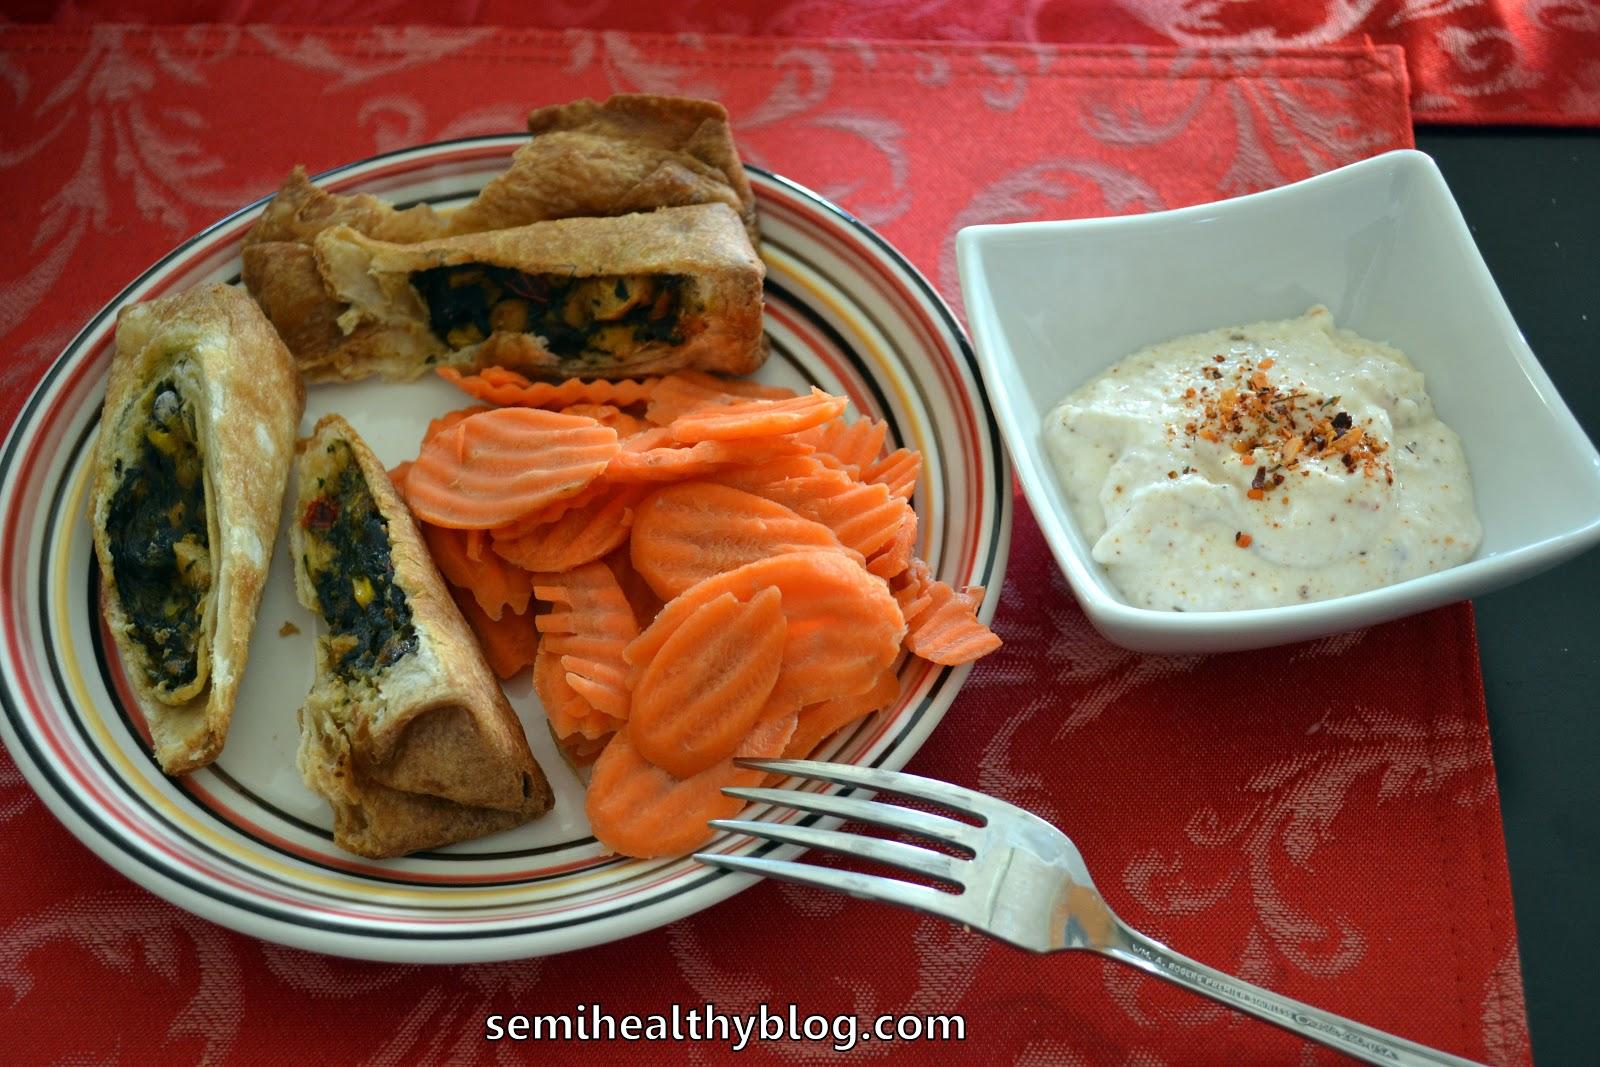 wiaw 47 leftover chili s diary of a semi health nut